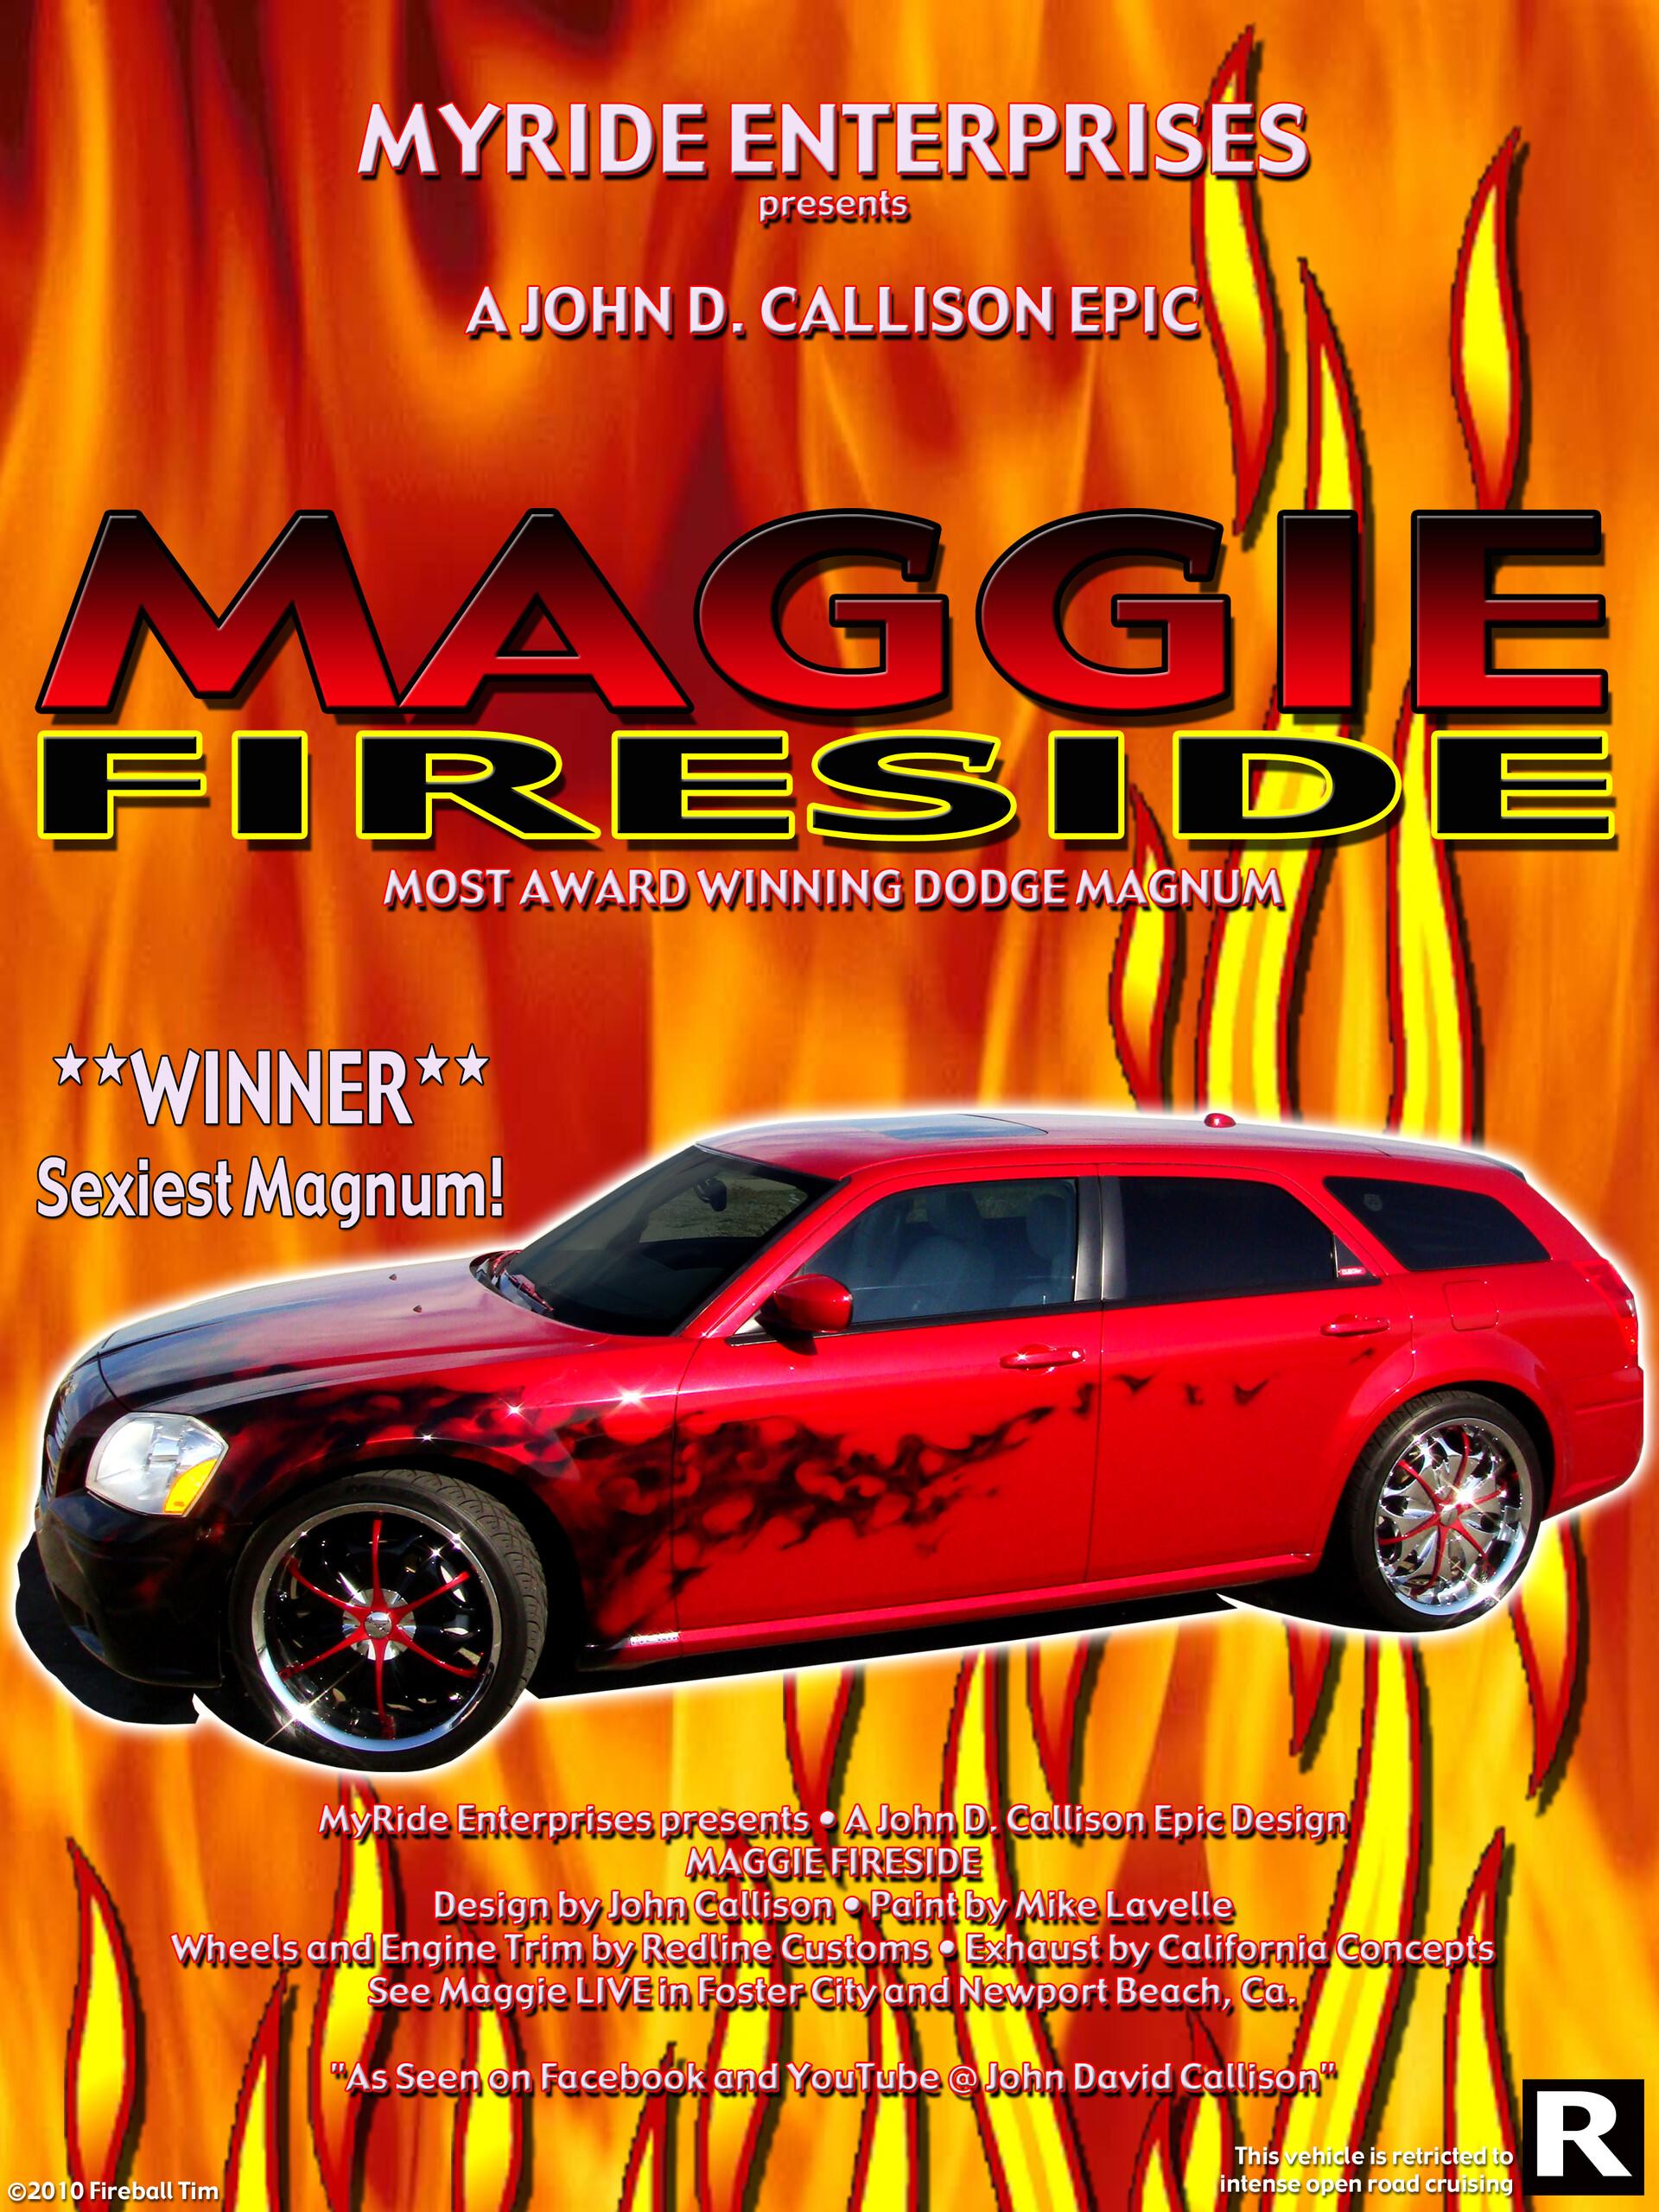 MAGGIE FIRESIDE - Client - John Callison